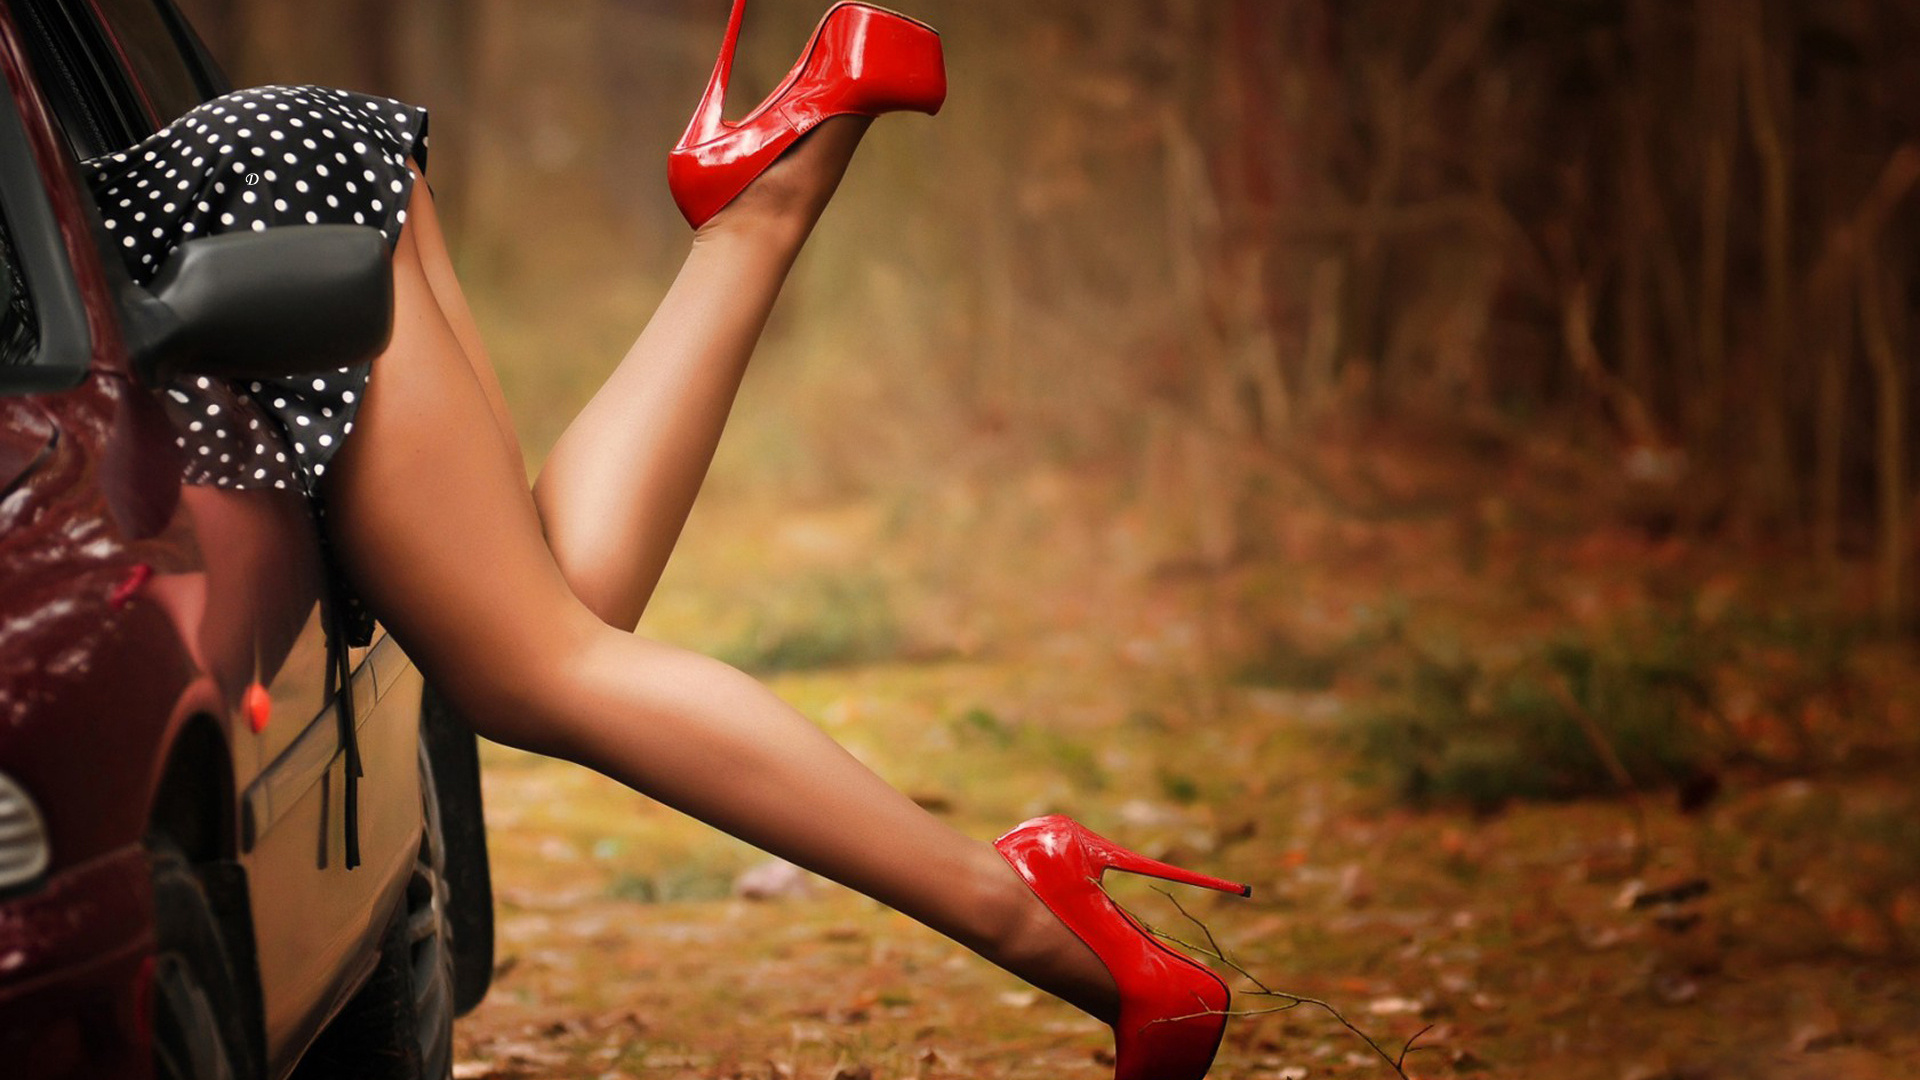 armavir-prostitutki